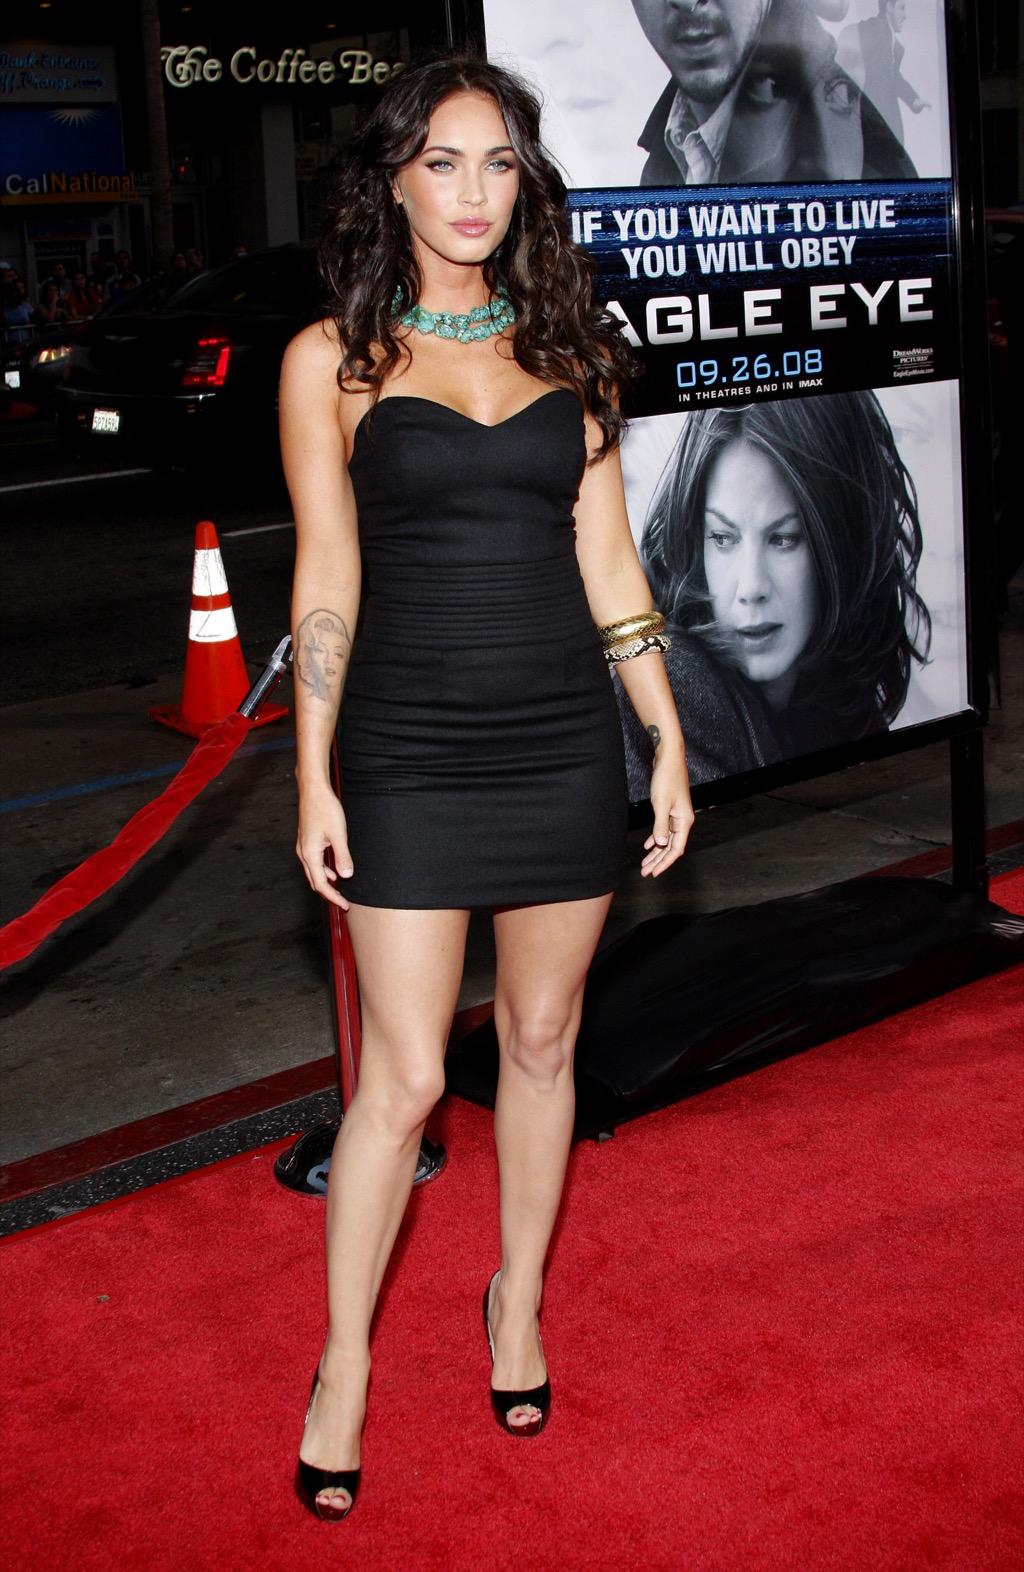 Megan Fox Interviews That Ruined Celebrities' Careers